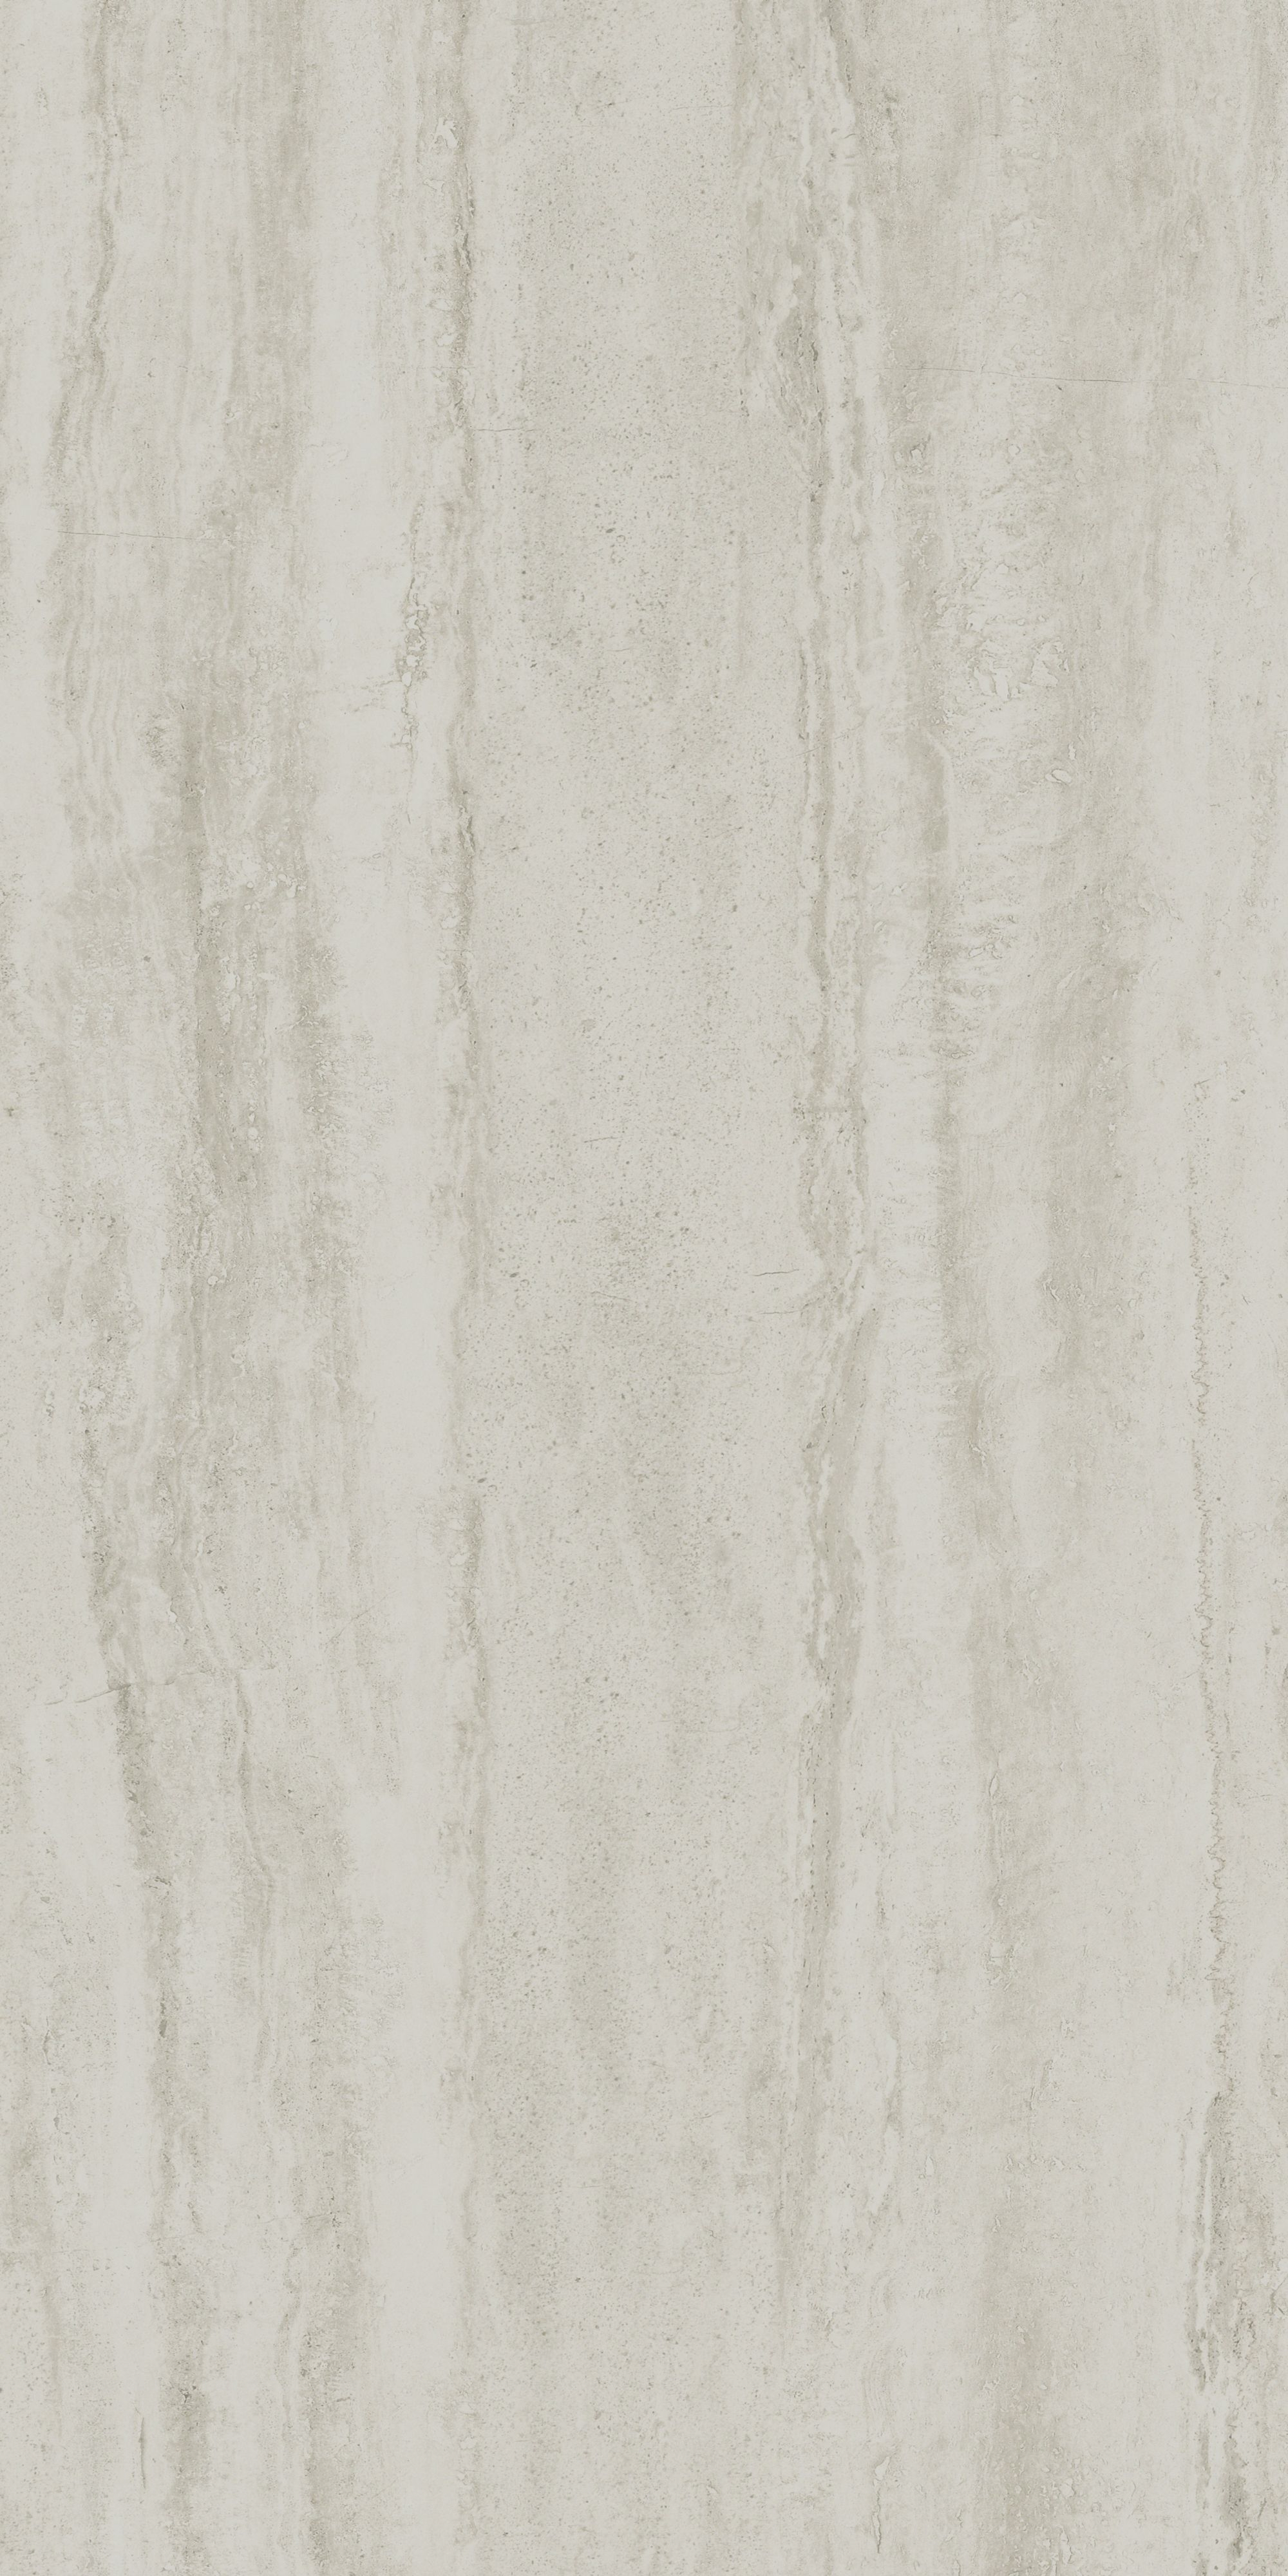 B q bathroom scales - Anatolia Ivory Stone Effect Plain Porcelain Wall Floor Tile Pack Of 6